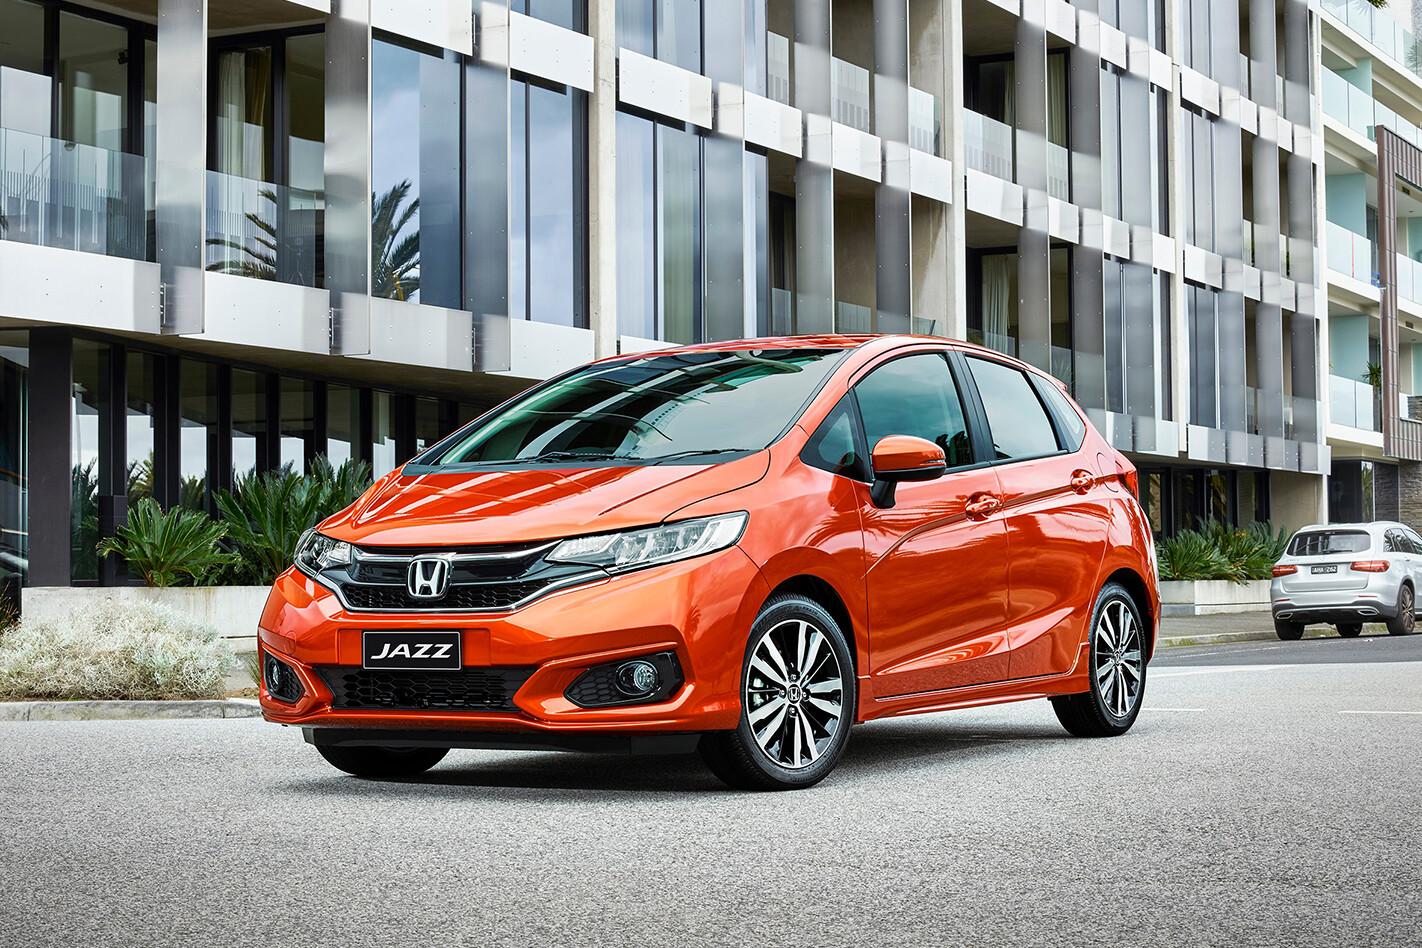 Honda Jazz discontinued